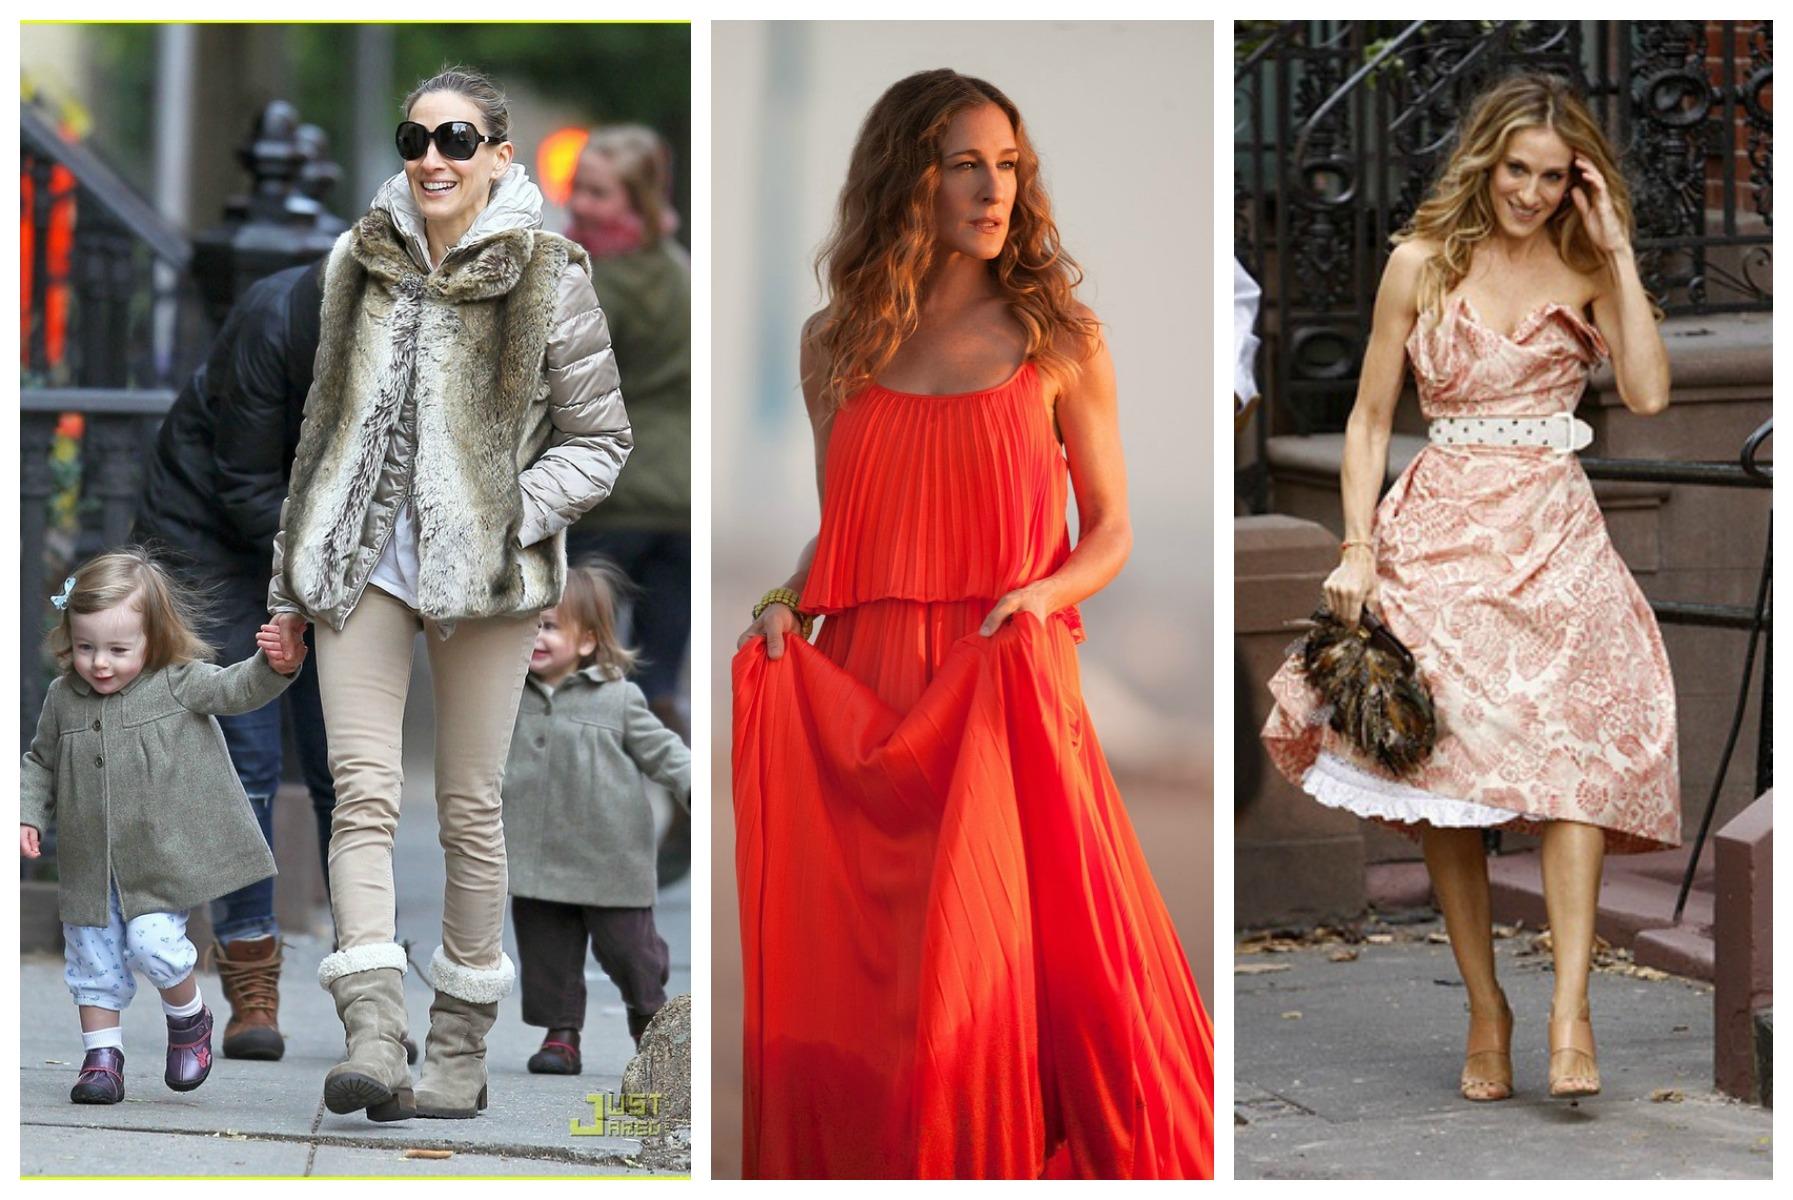 vith.es consultoria de moda estilo outfit sarah jessica parker style looks sex and the city antonio pozuelo (2)